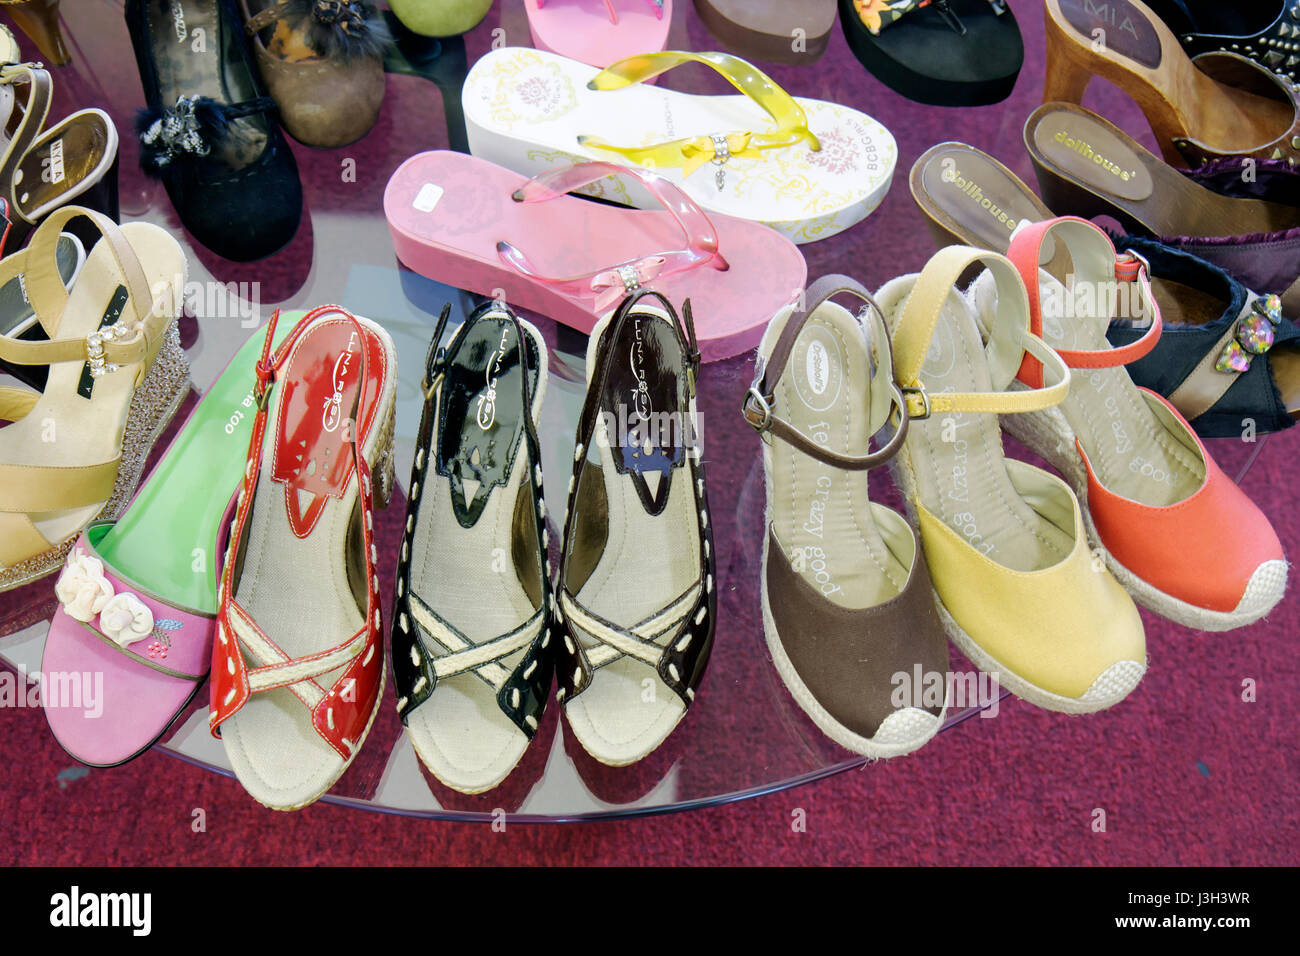 e0b2c6375ca2 Miami Beach Florida Collins Avenue Shoe Freak store retail shoe women s  shoes display sandals brands colors fashion variety foot